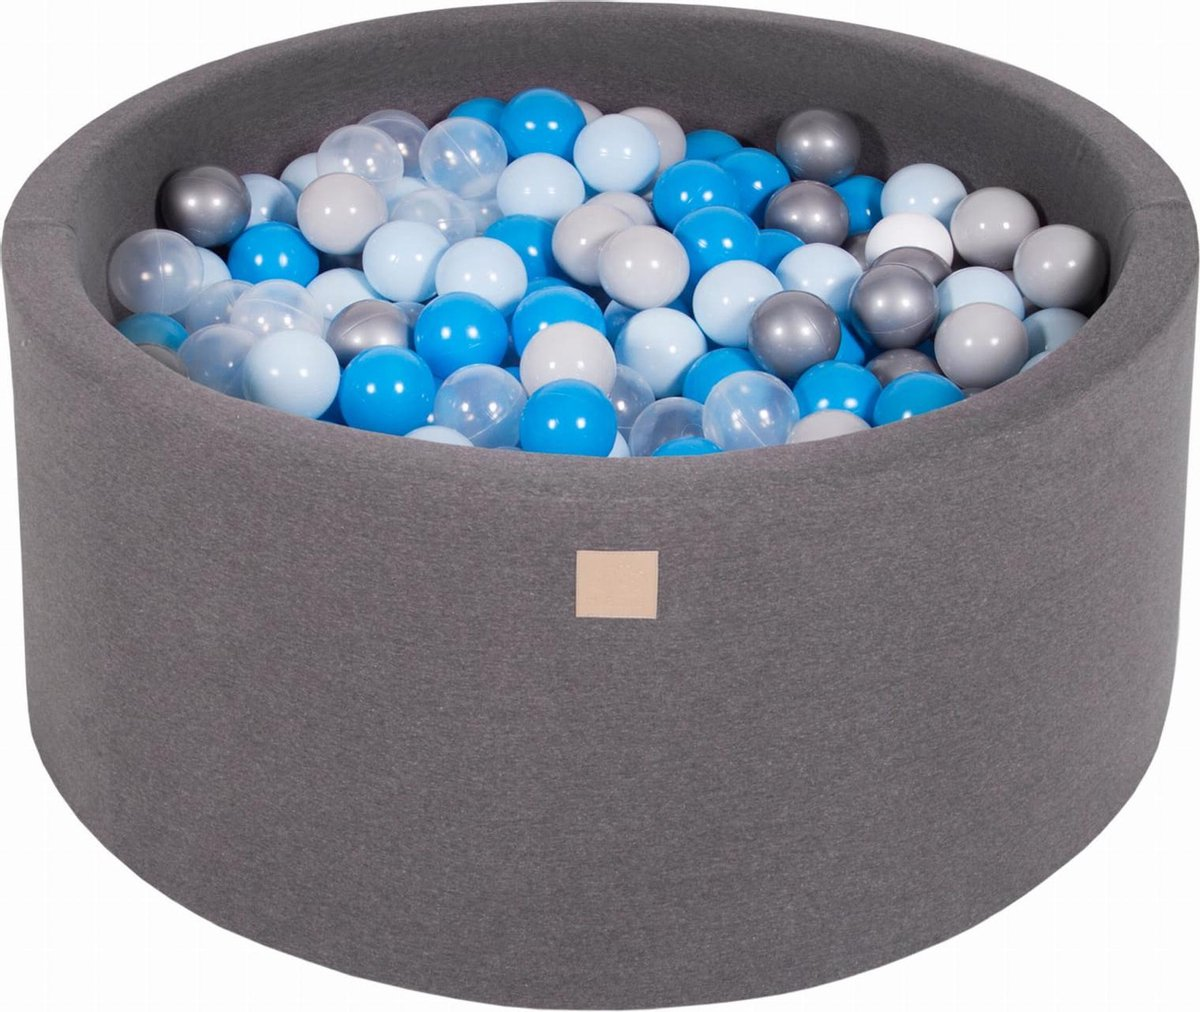 Ronde Ballenbak set incl 300 ballen 90x40cm - Donker Grijs: Blauw, Transparant, Babyblauw, Zilver